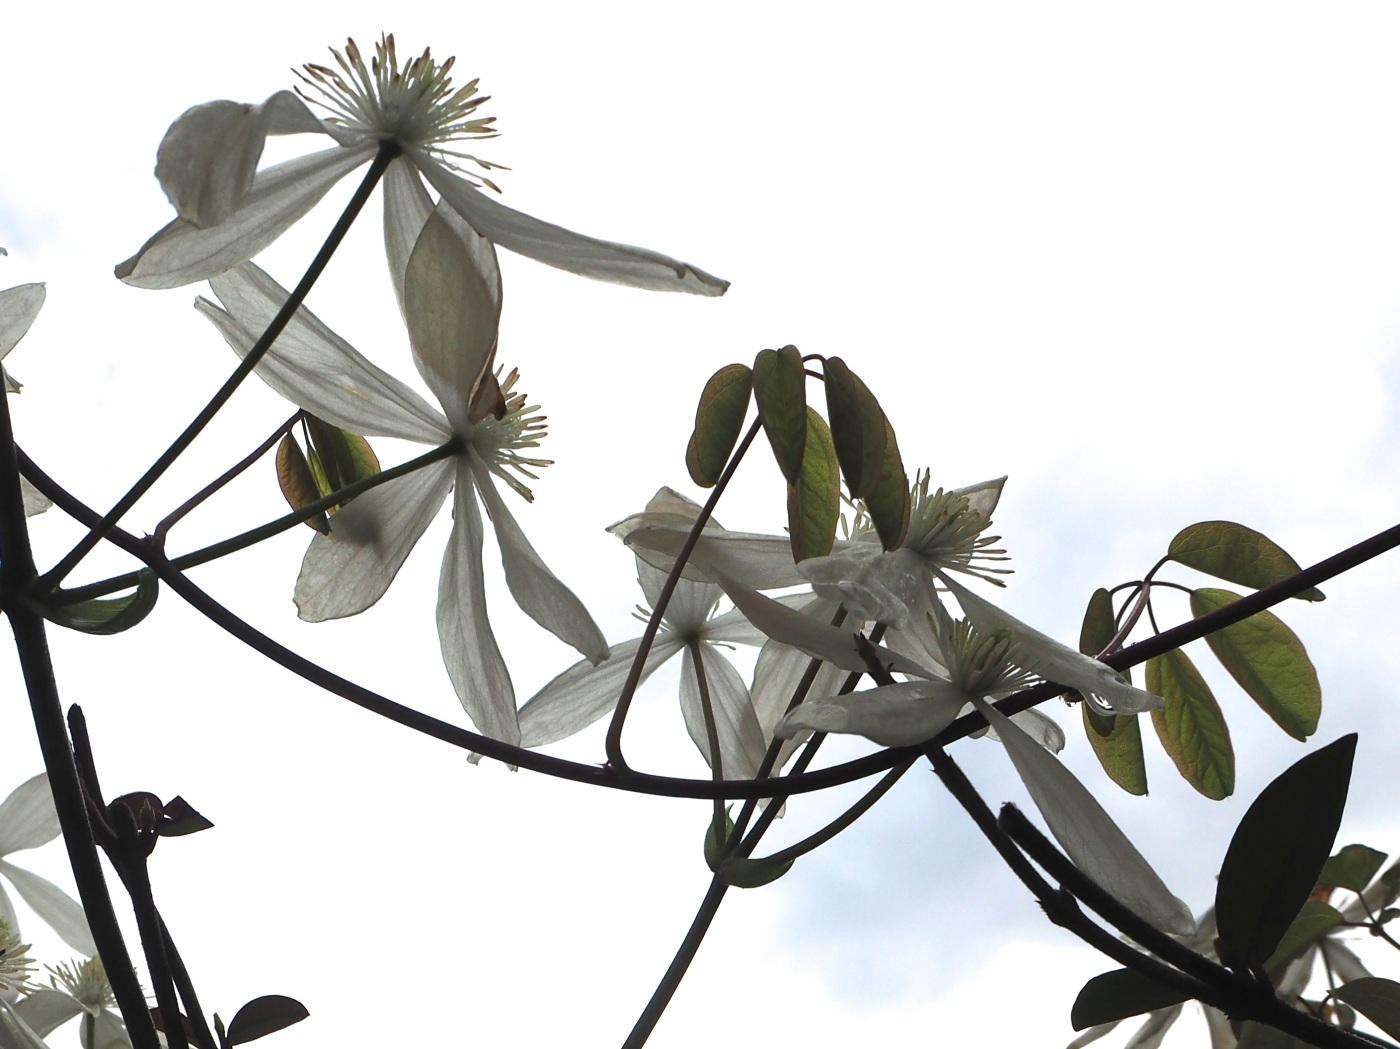 Clematis armandii flowers